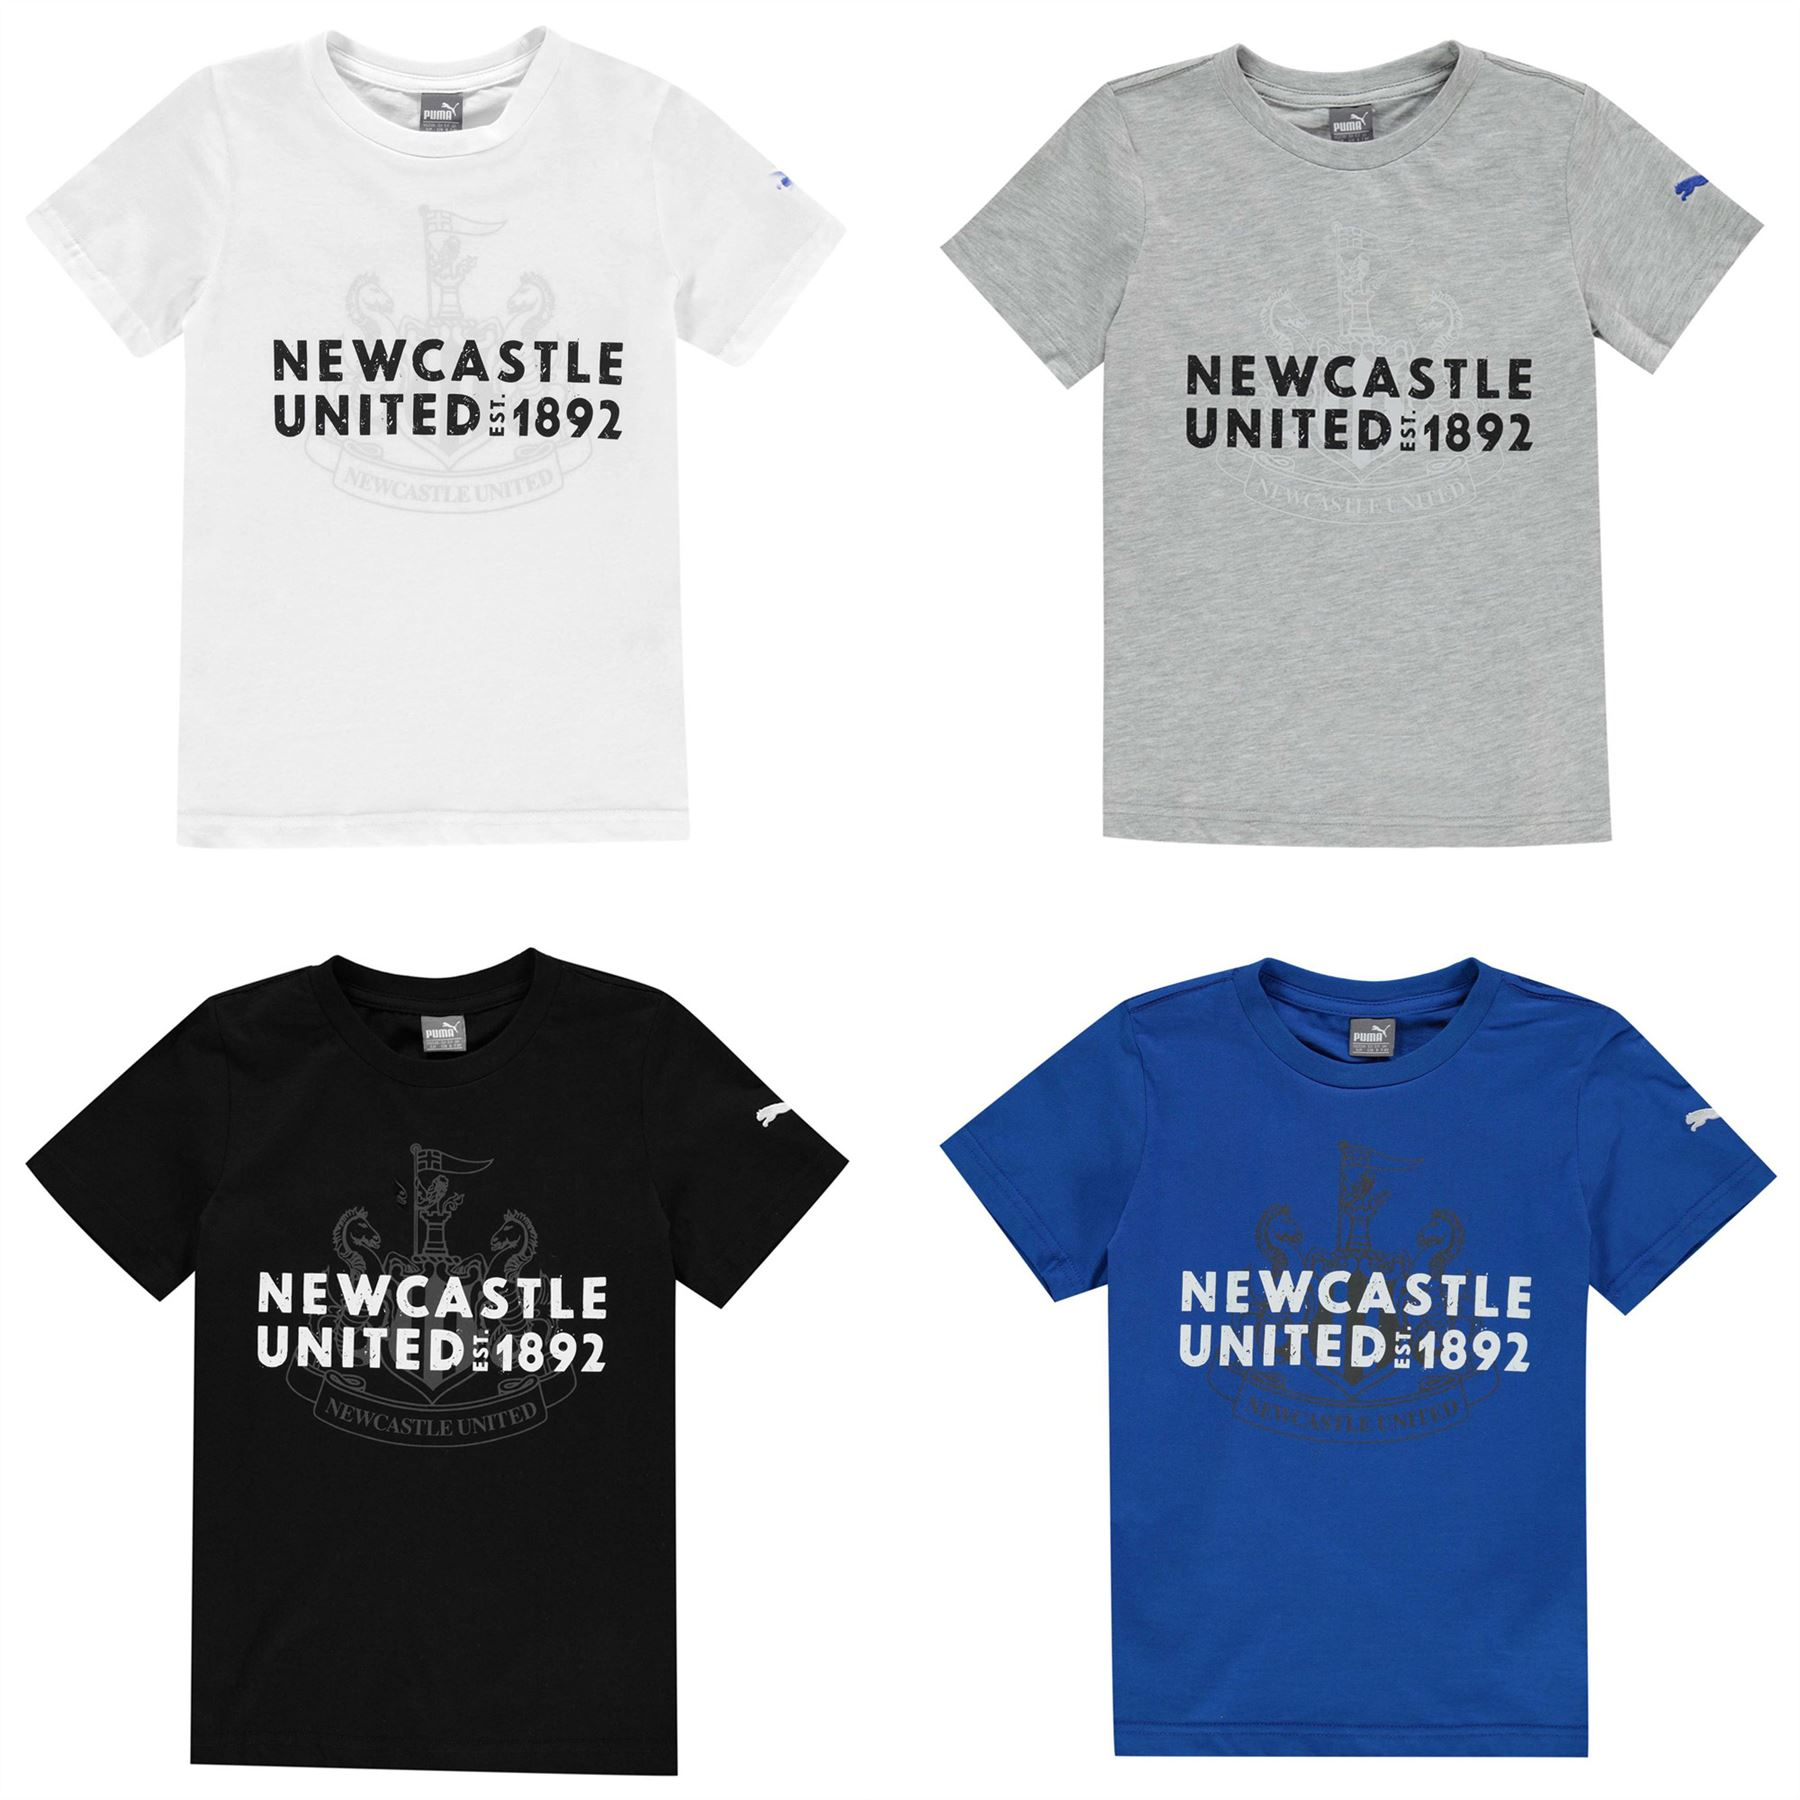 4640125e5657 ... Puma Newcastle United Graphic T-Shirt Juniors Football Soccer Fan Top Tee  Shirt ...